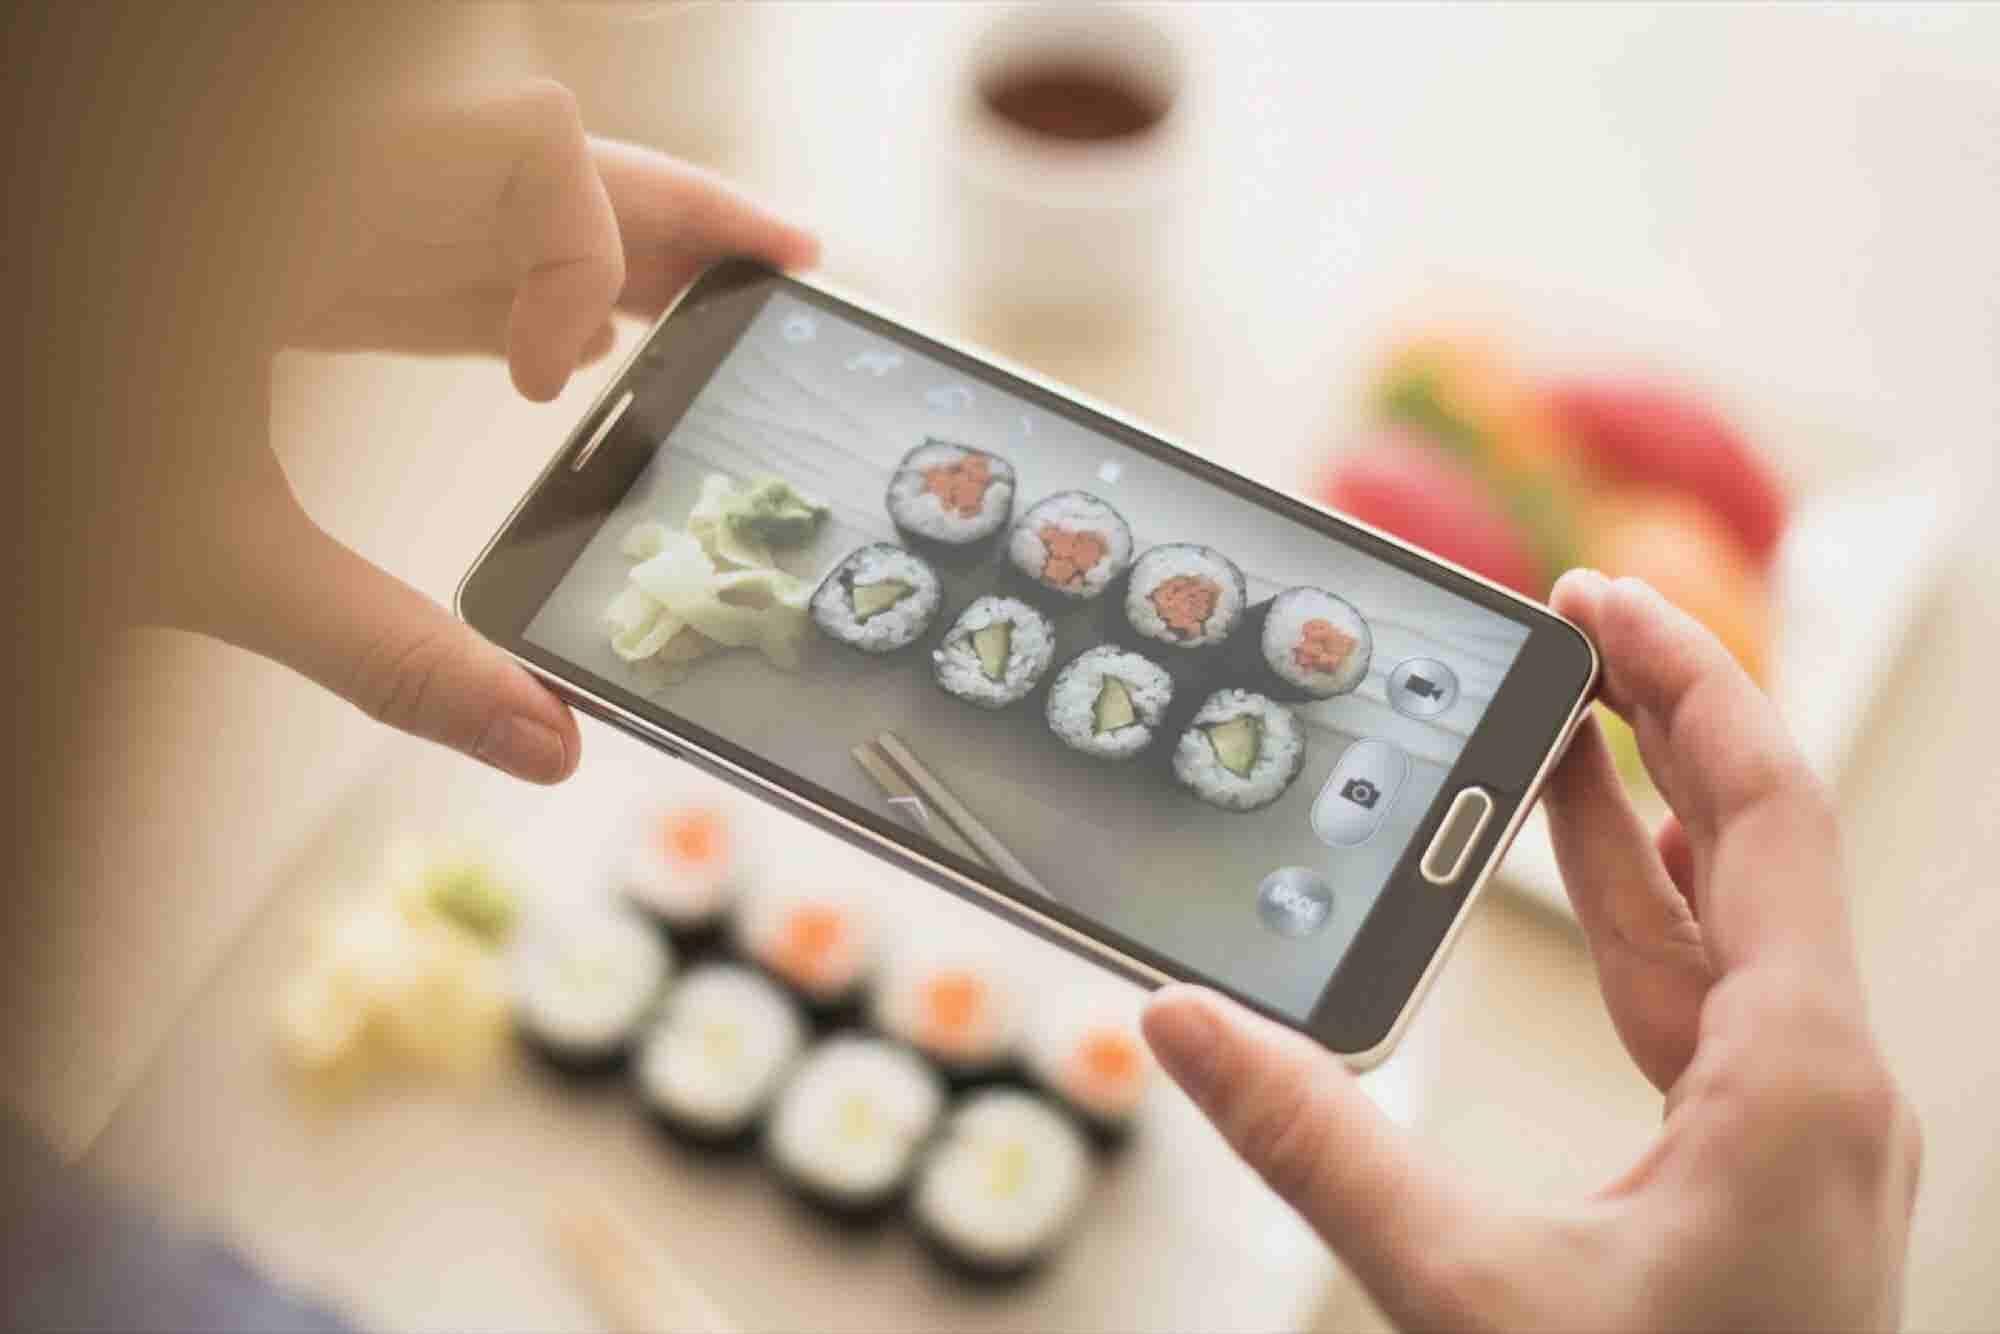 6 Ways Service-Based Businesses Can Market on Instagram